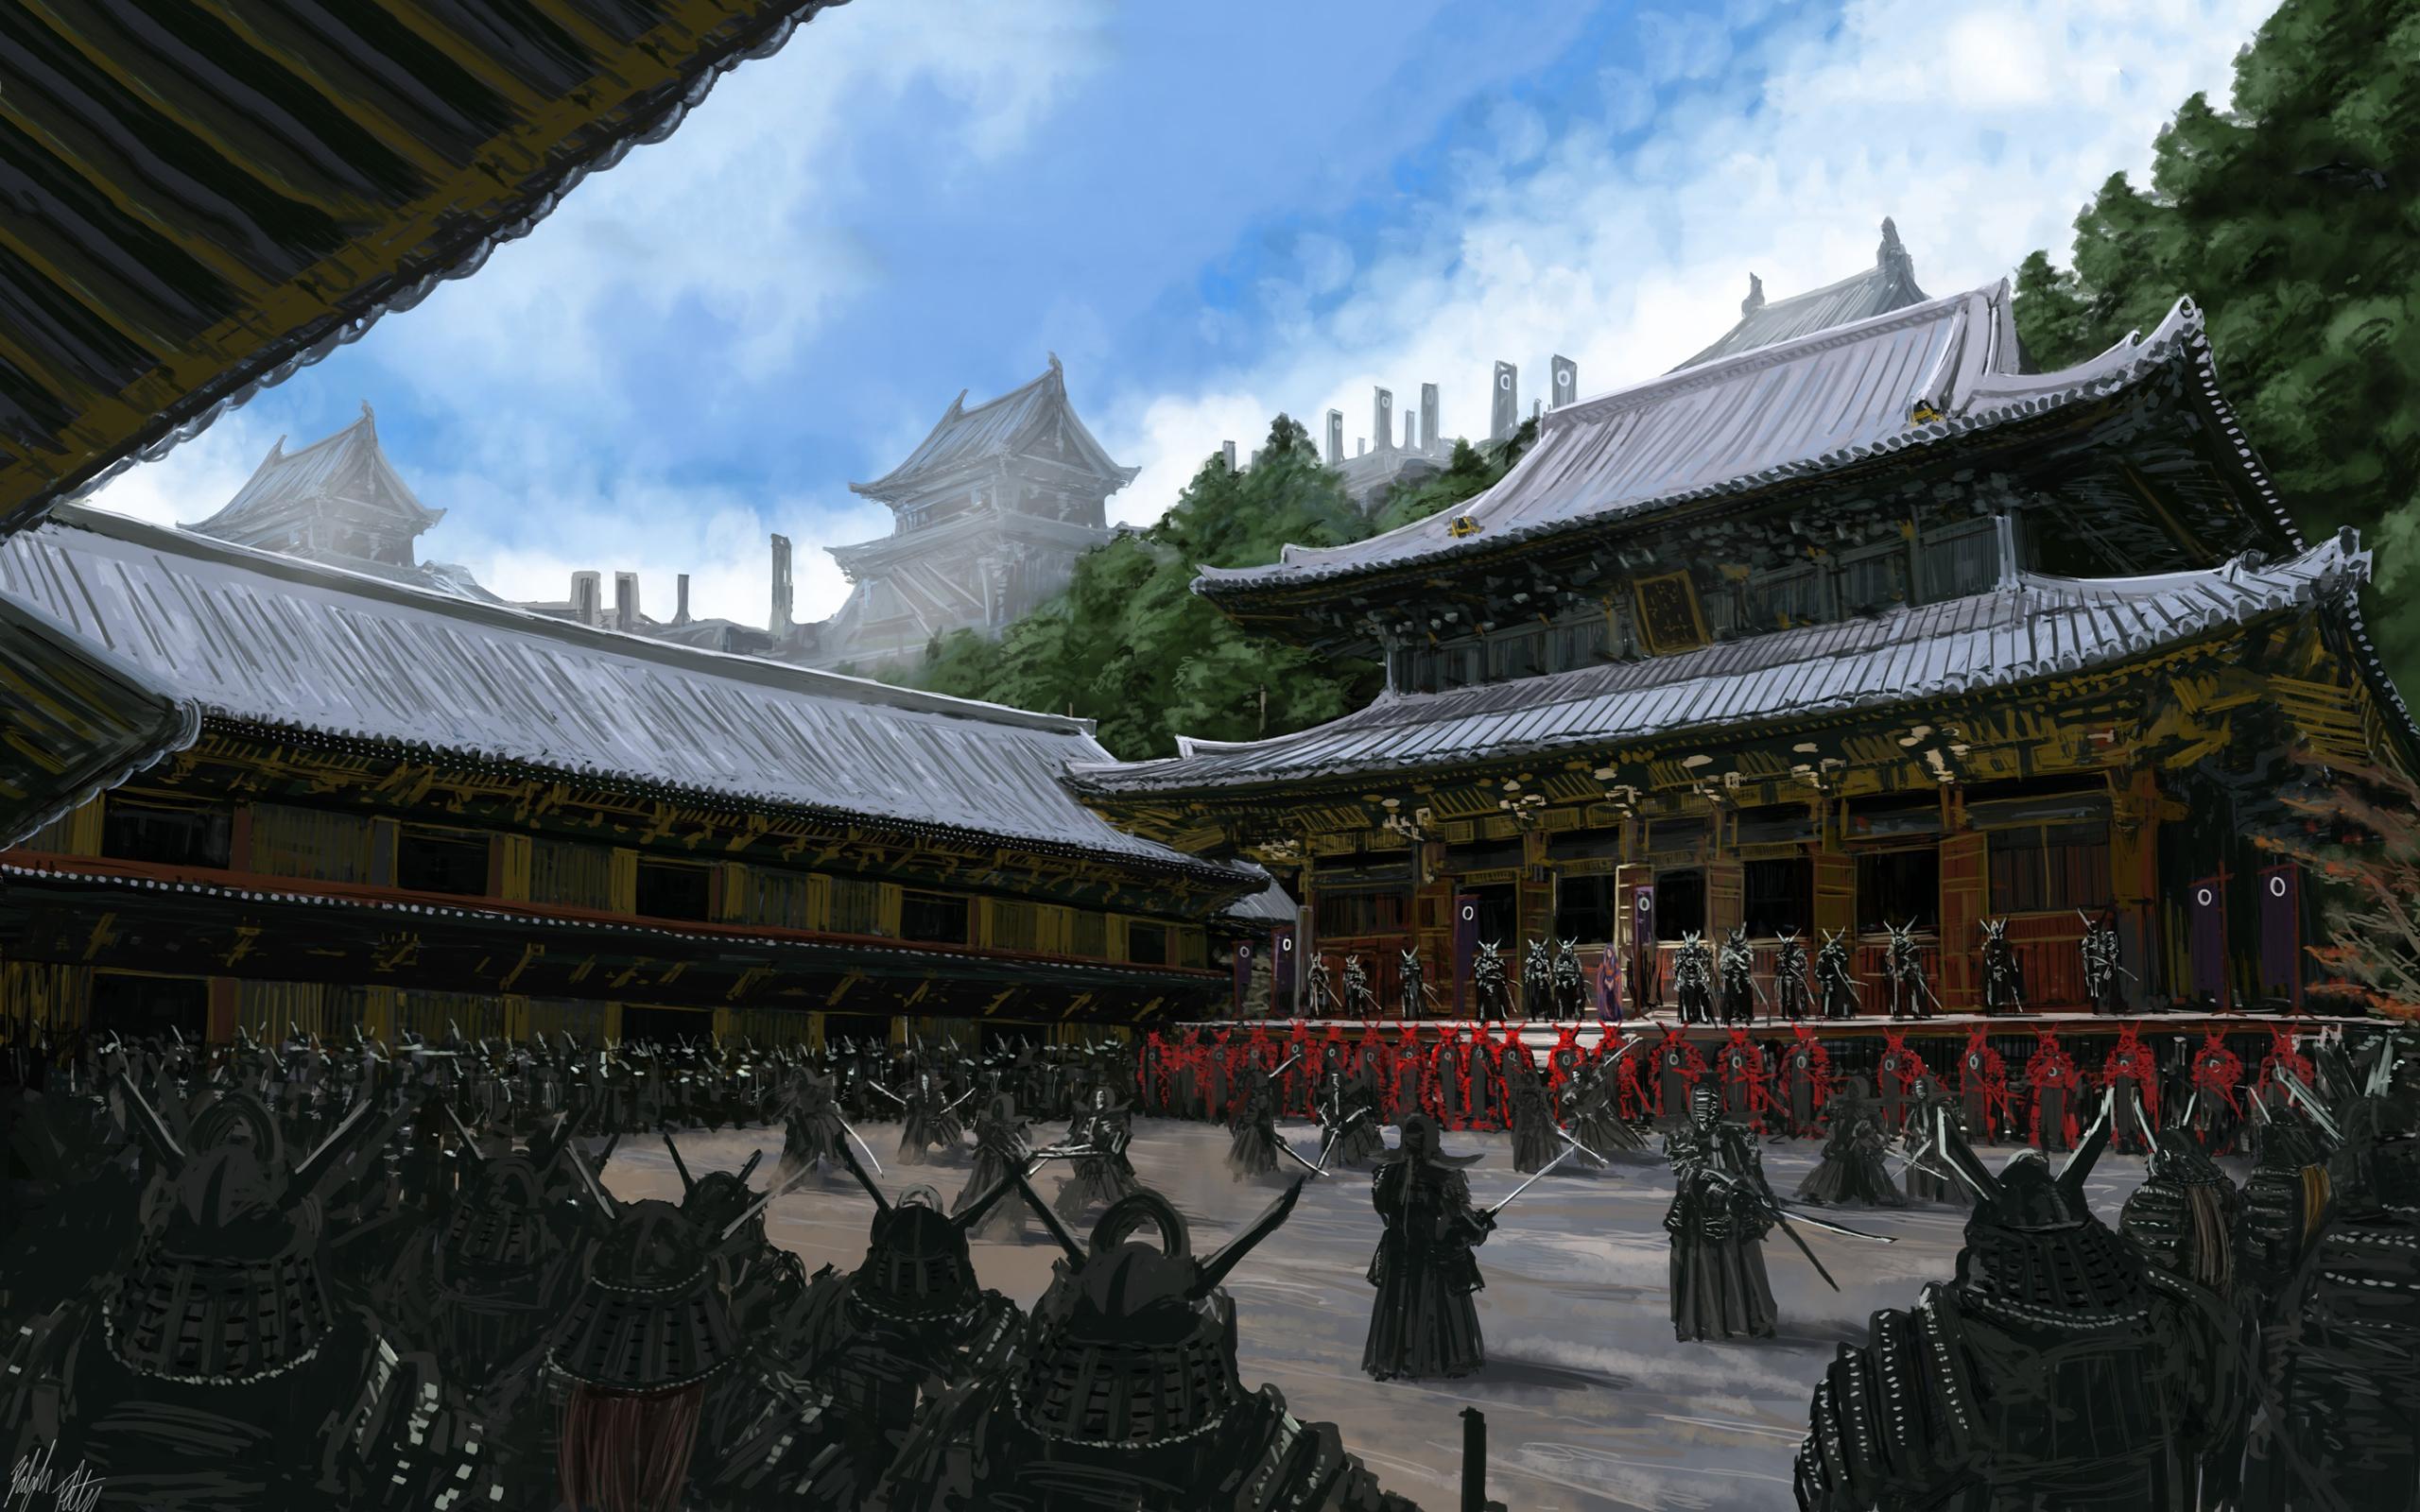 Samurai temple art